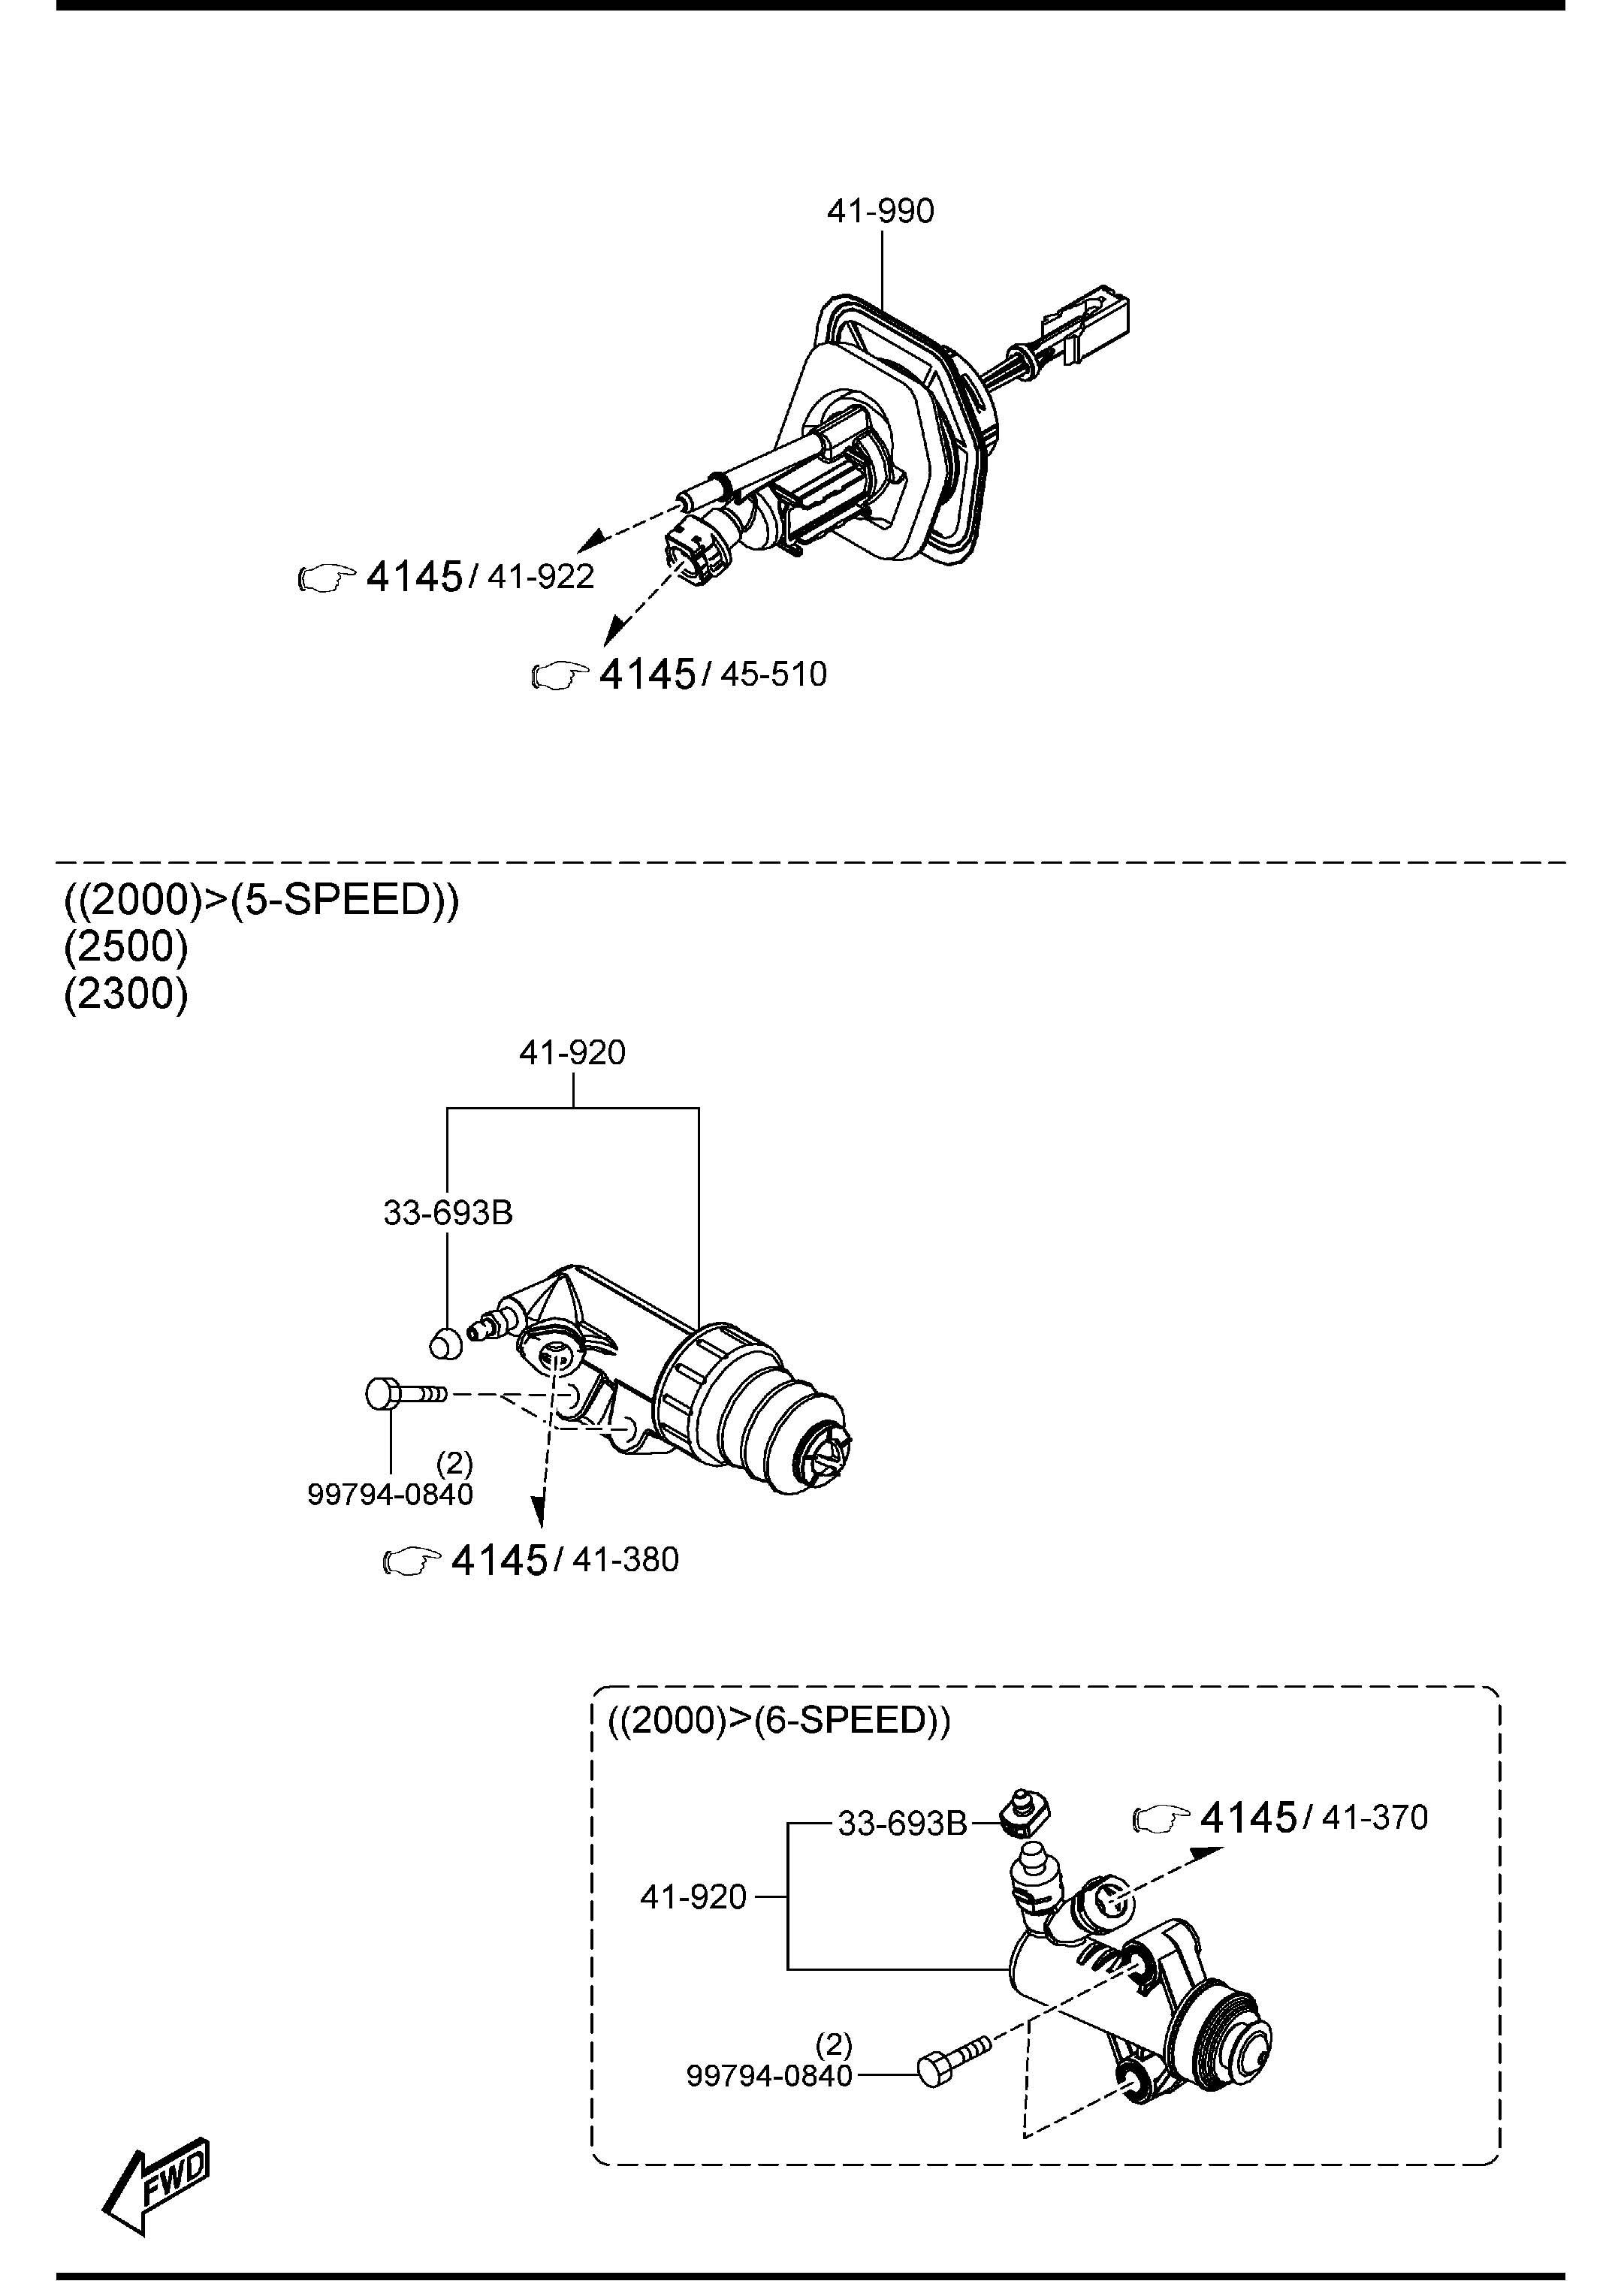 Mazda Wiring Diagram Torzone Org. Mazda. Auto Wiring Diagram